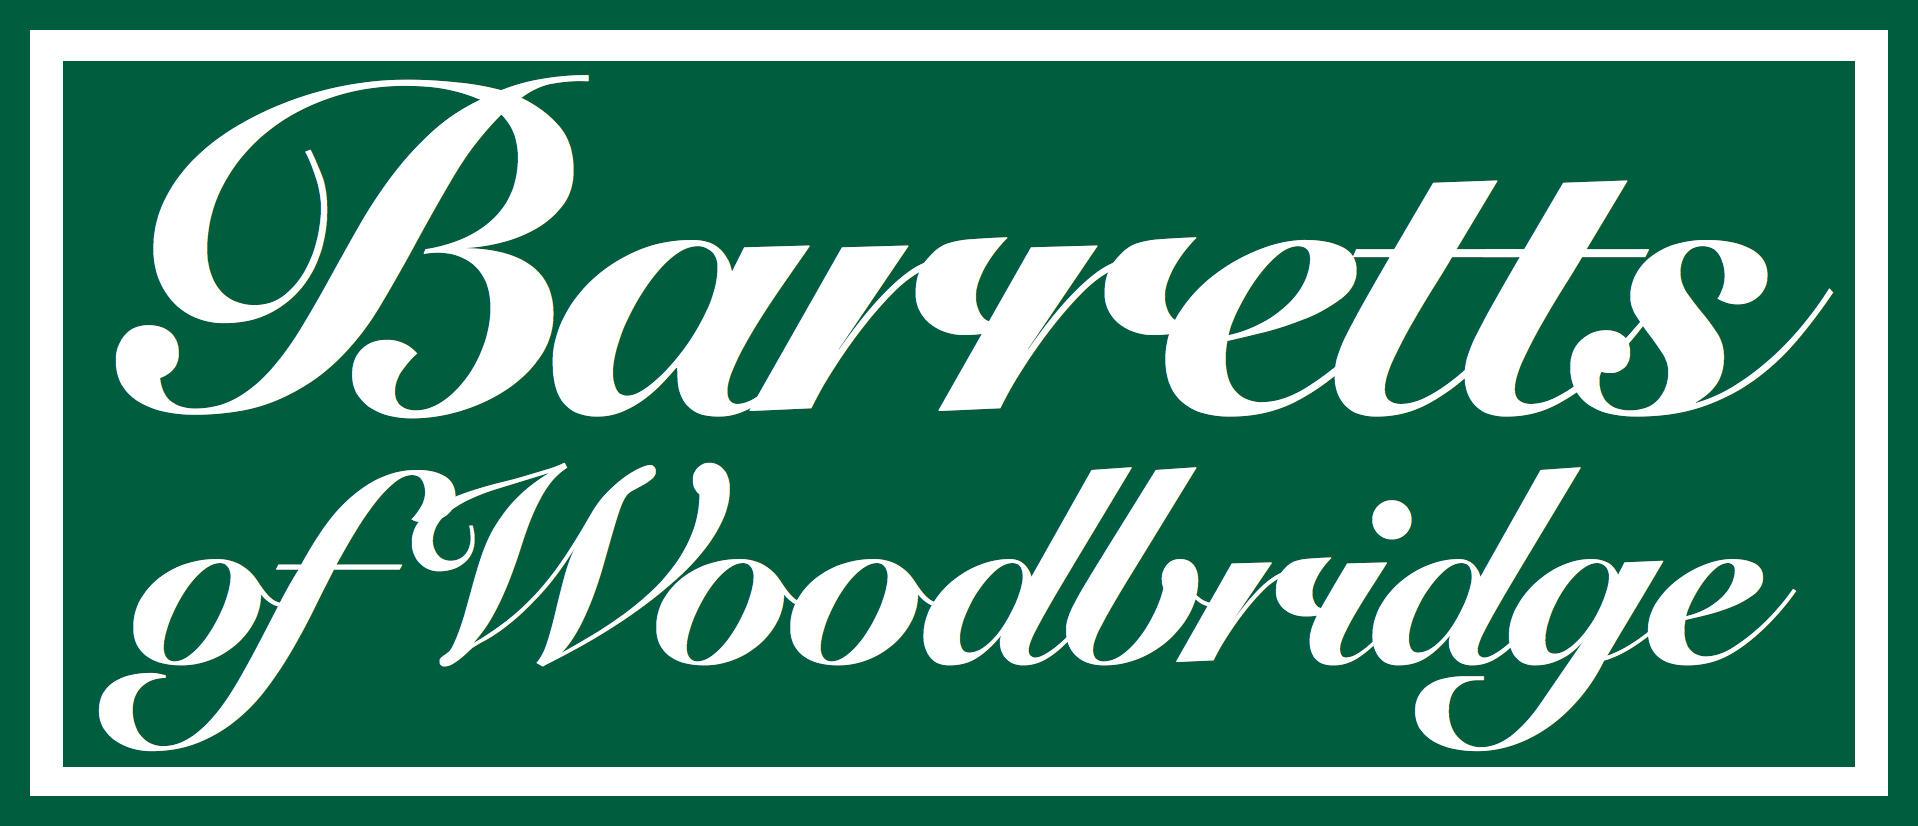 Barretts Of Woodbridge Logo V7 (JPEG)